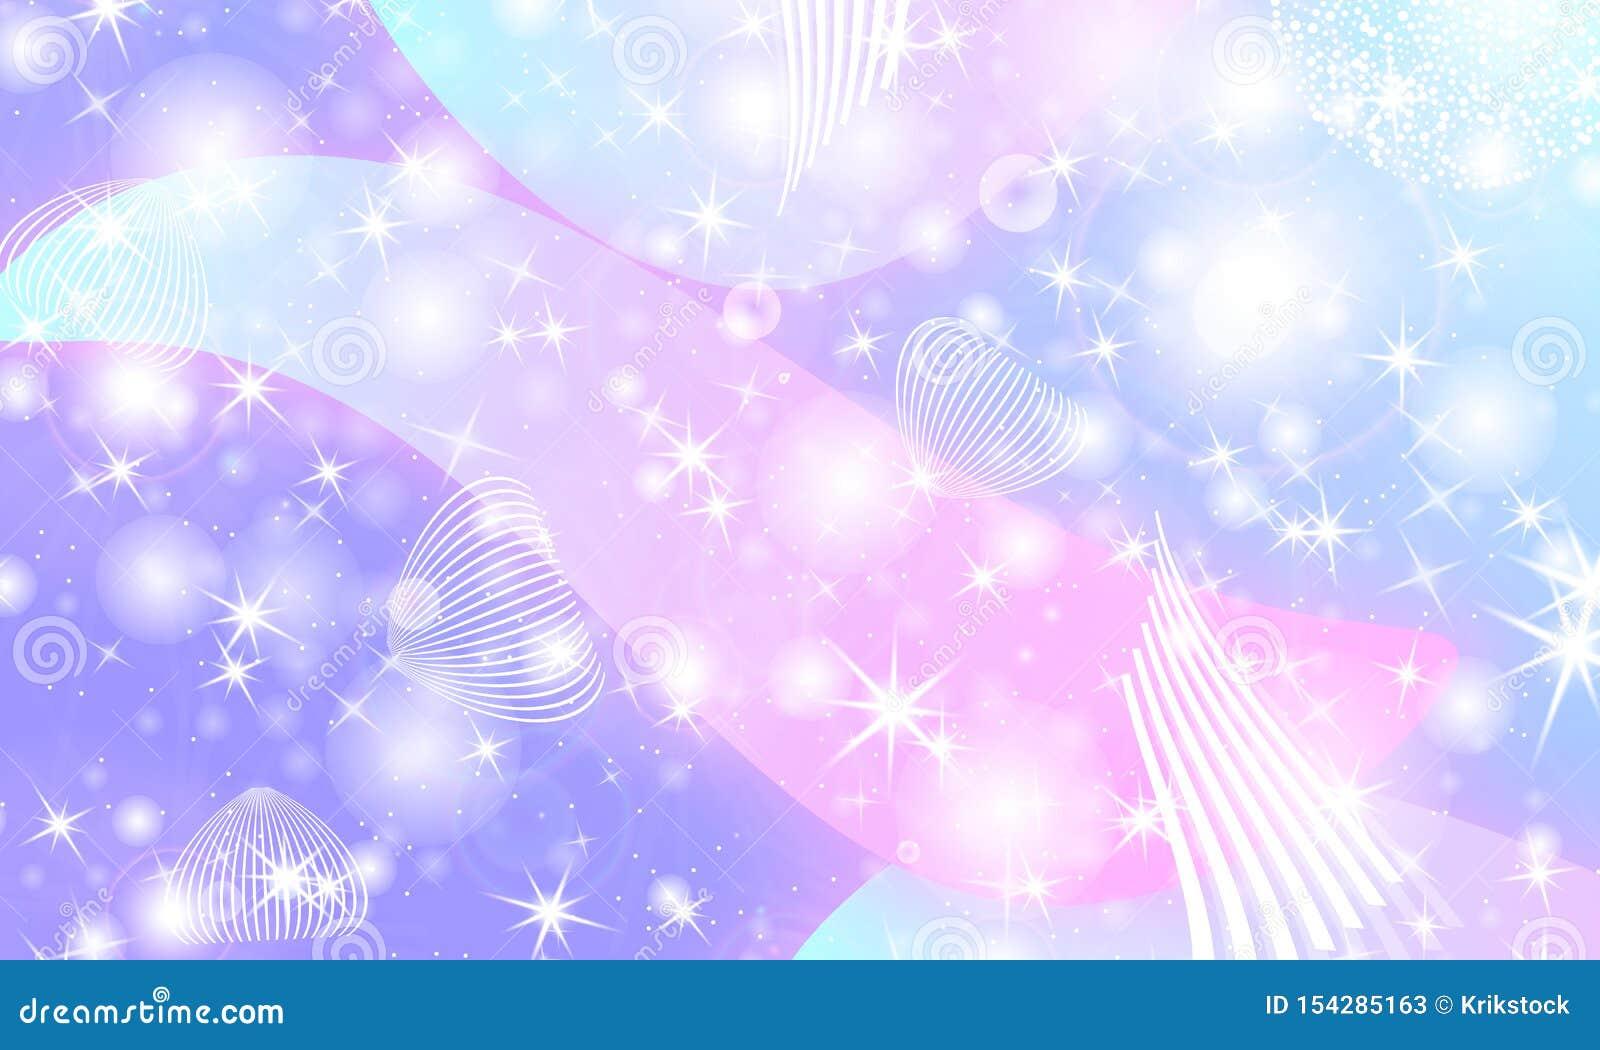 fairy background unicorn pattern princess rainbow galaxy mermaid fantasy stars pastel colors 154285163